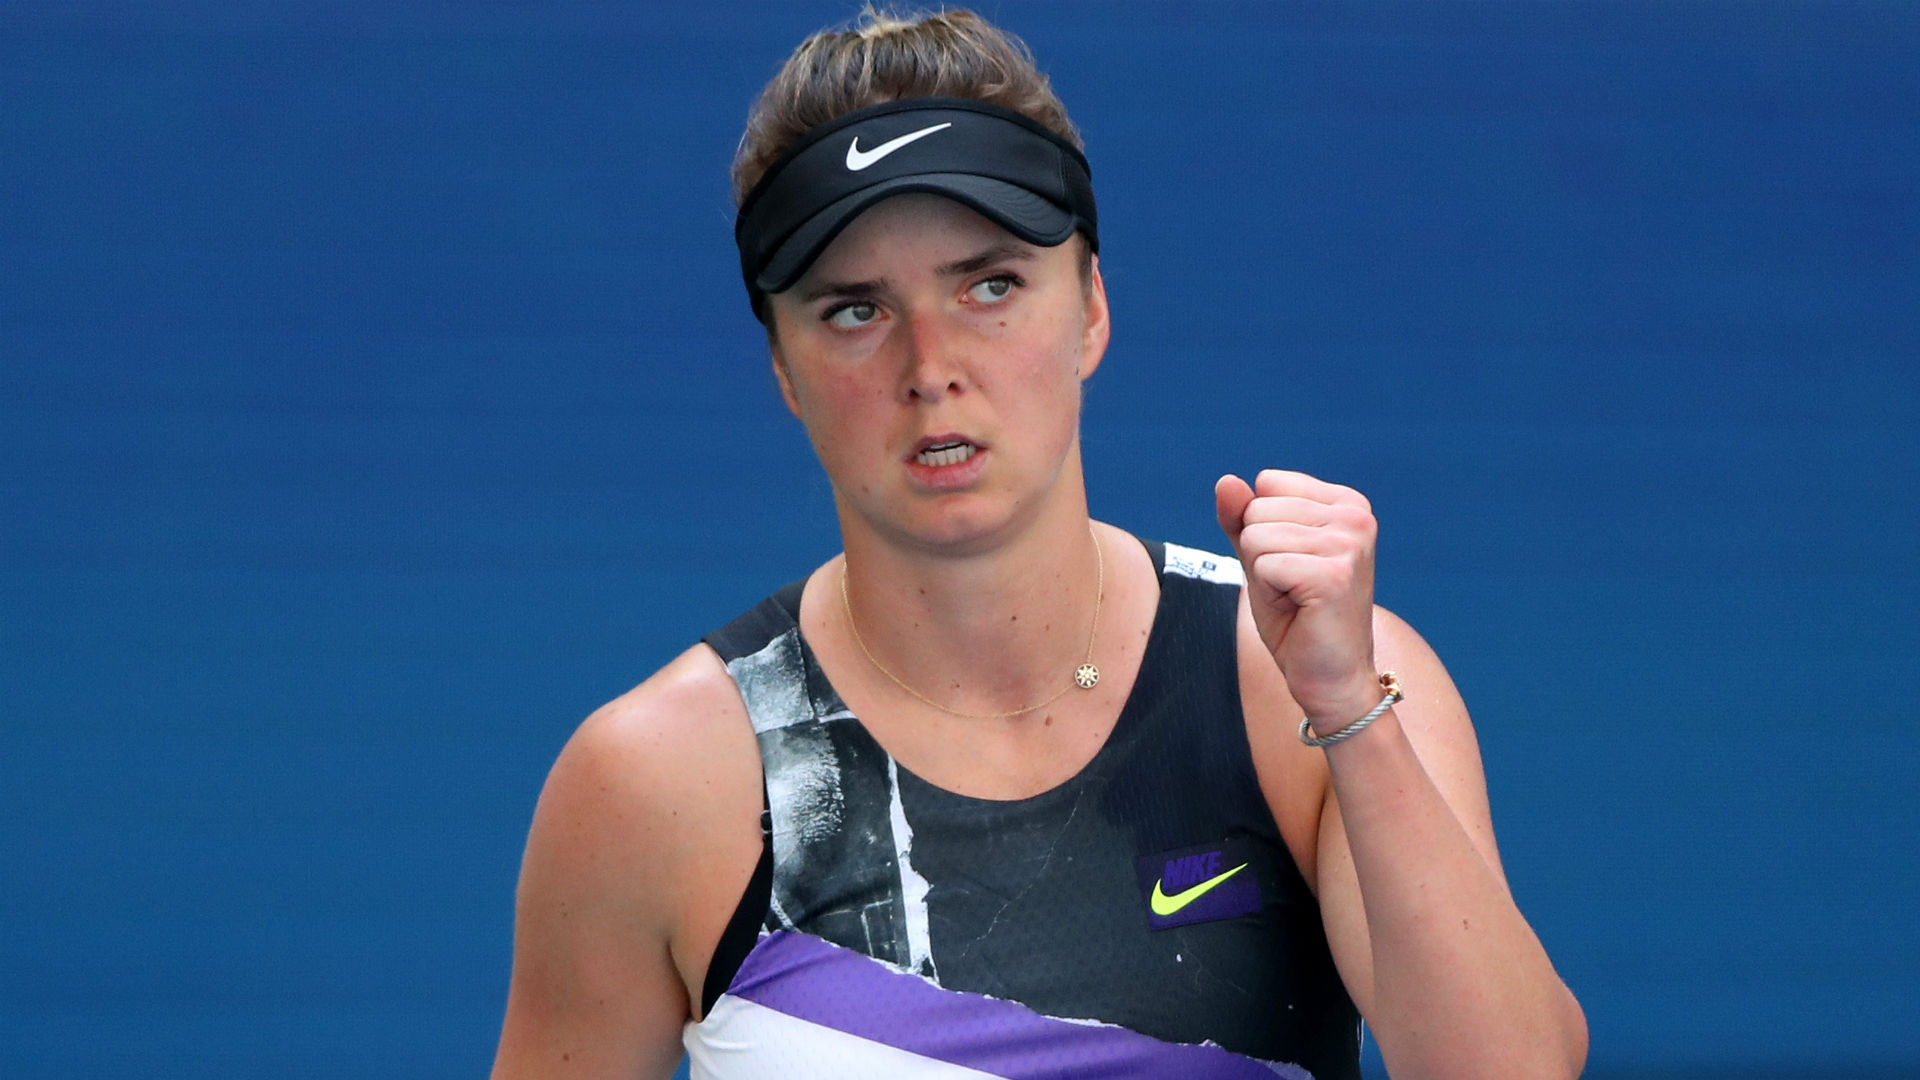 US Open 2019: Svitolina sees off Konta to reach maiden New York semi-final